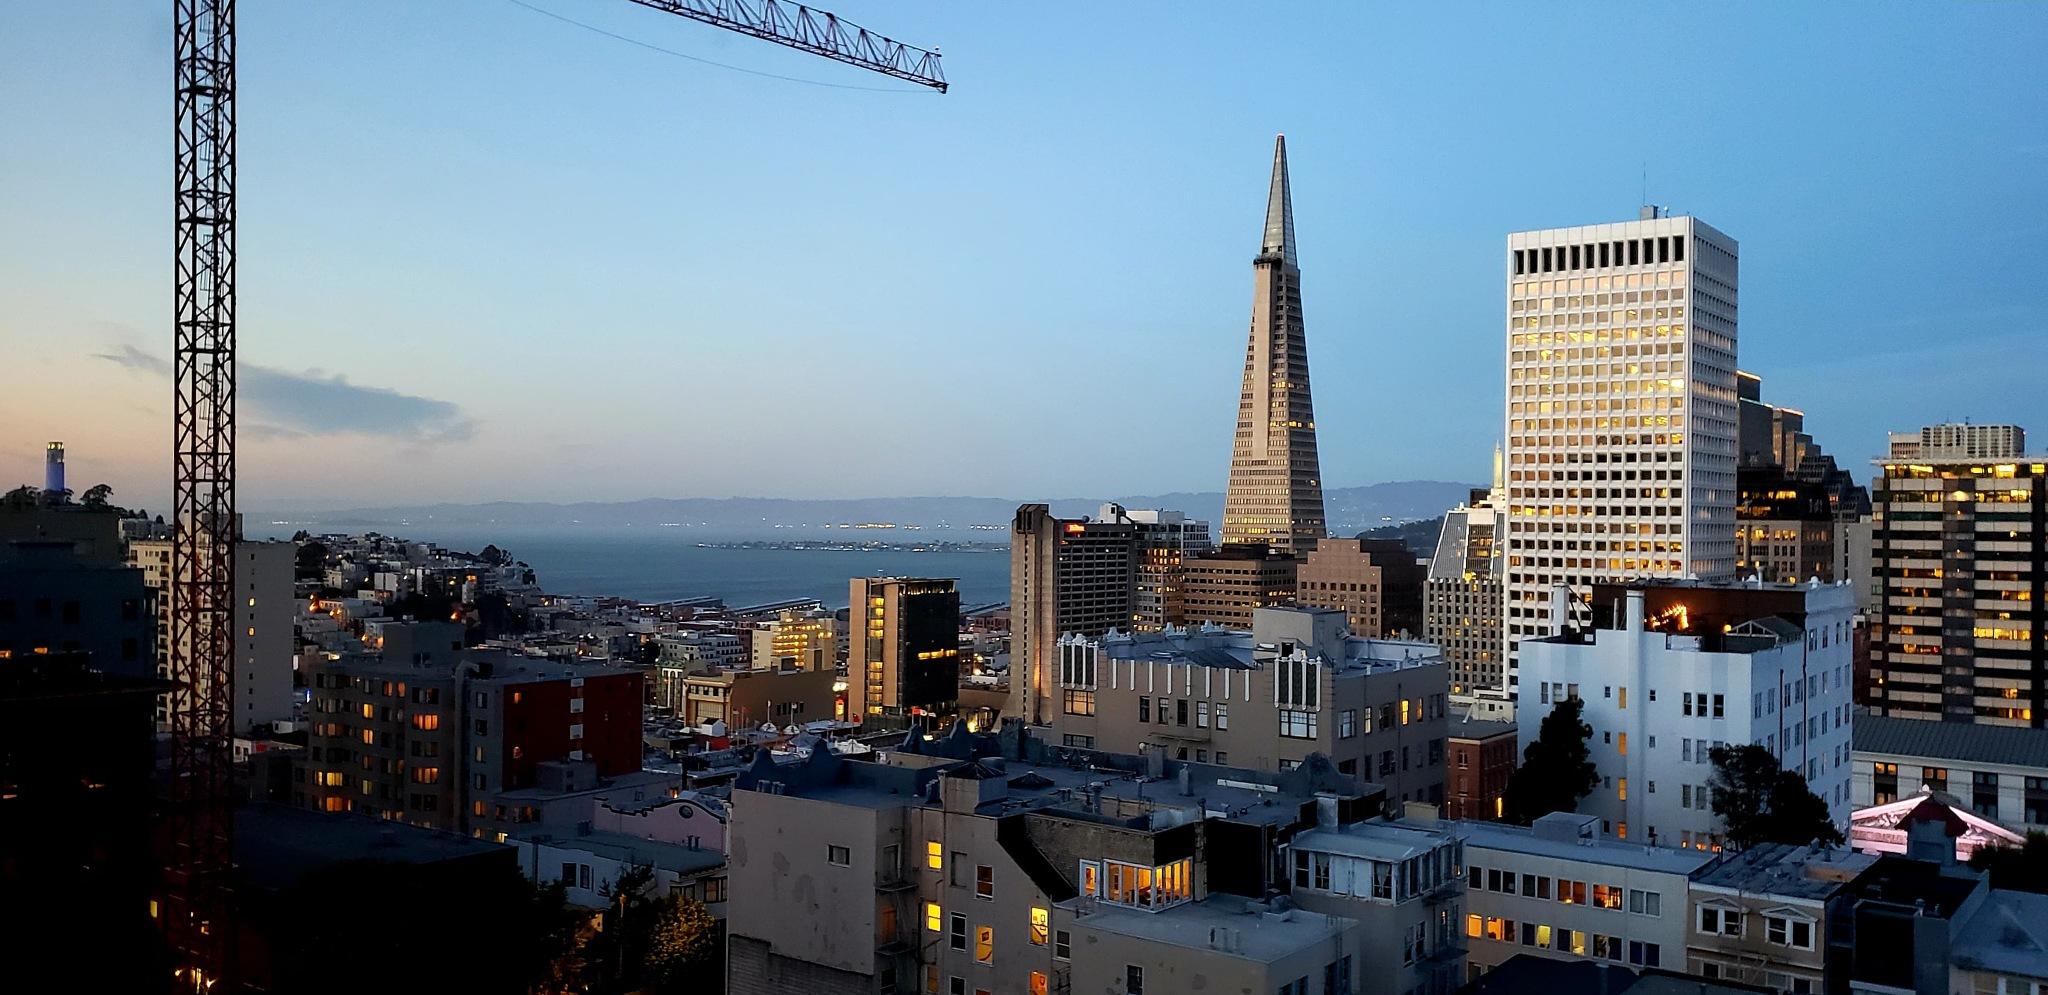 San Francisco at Dusk... by teresa.thiele1